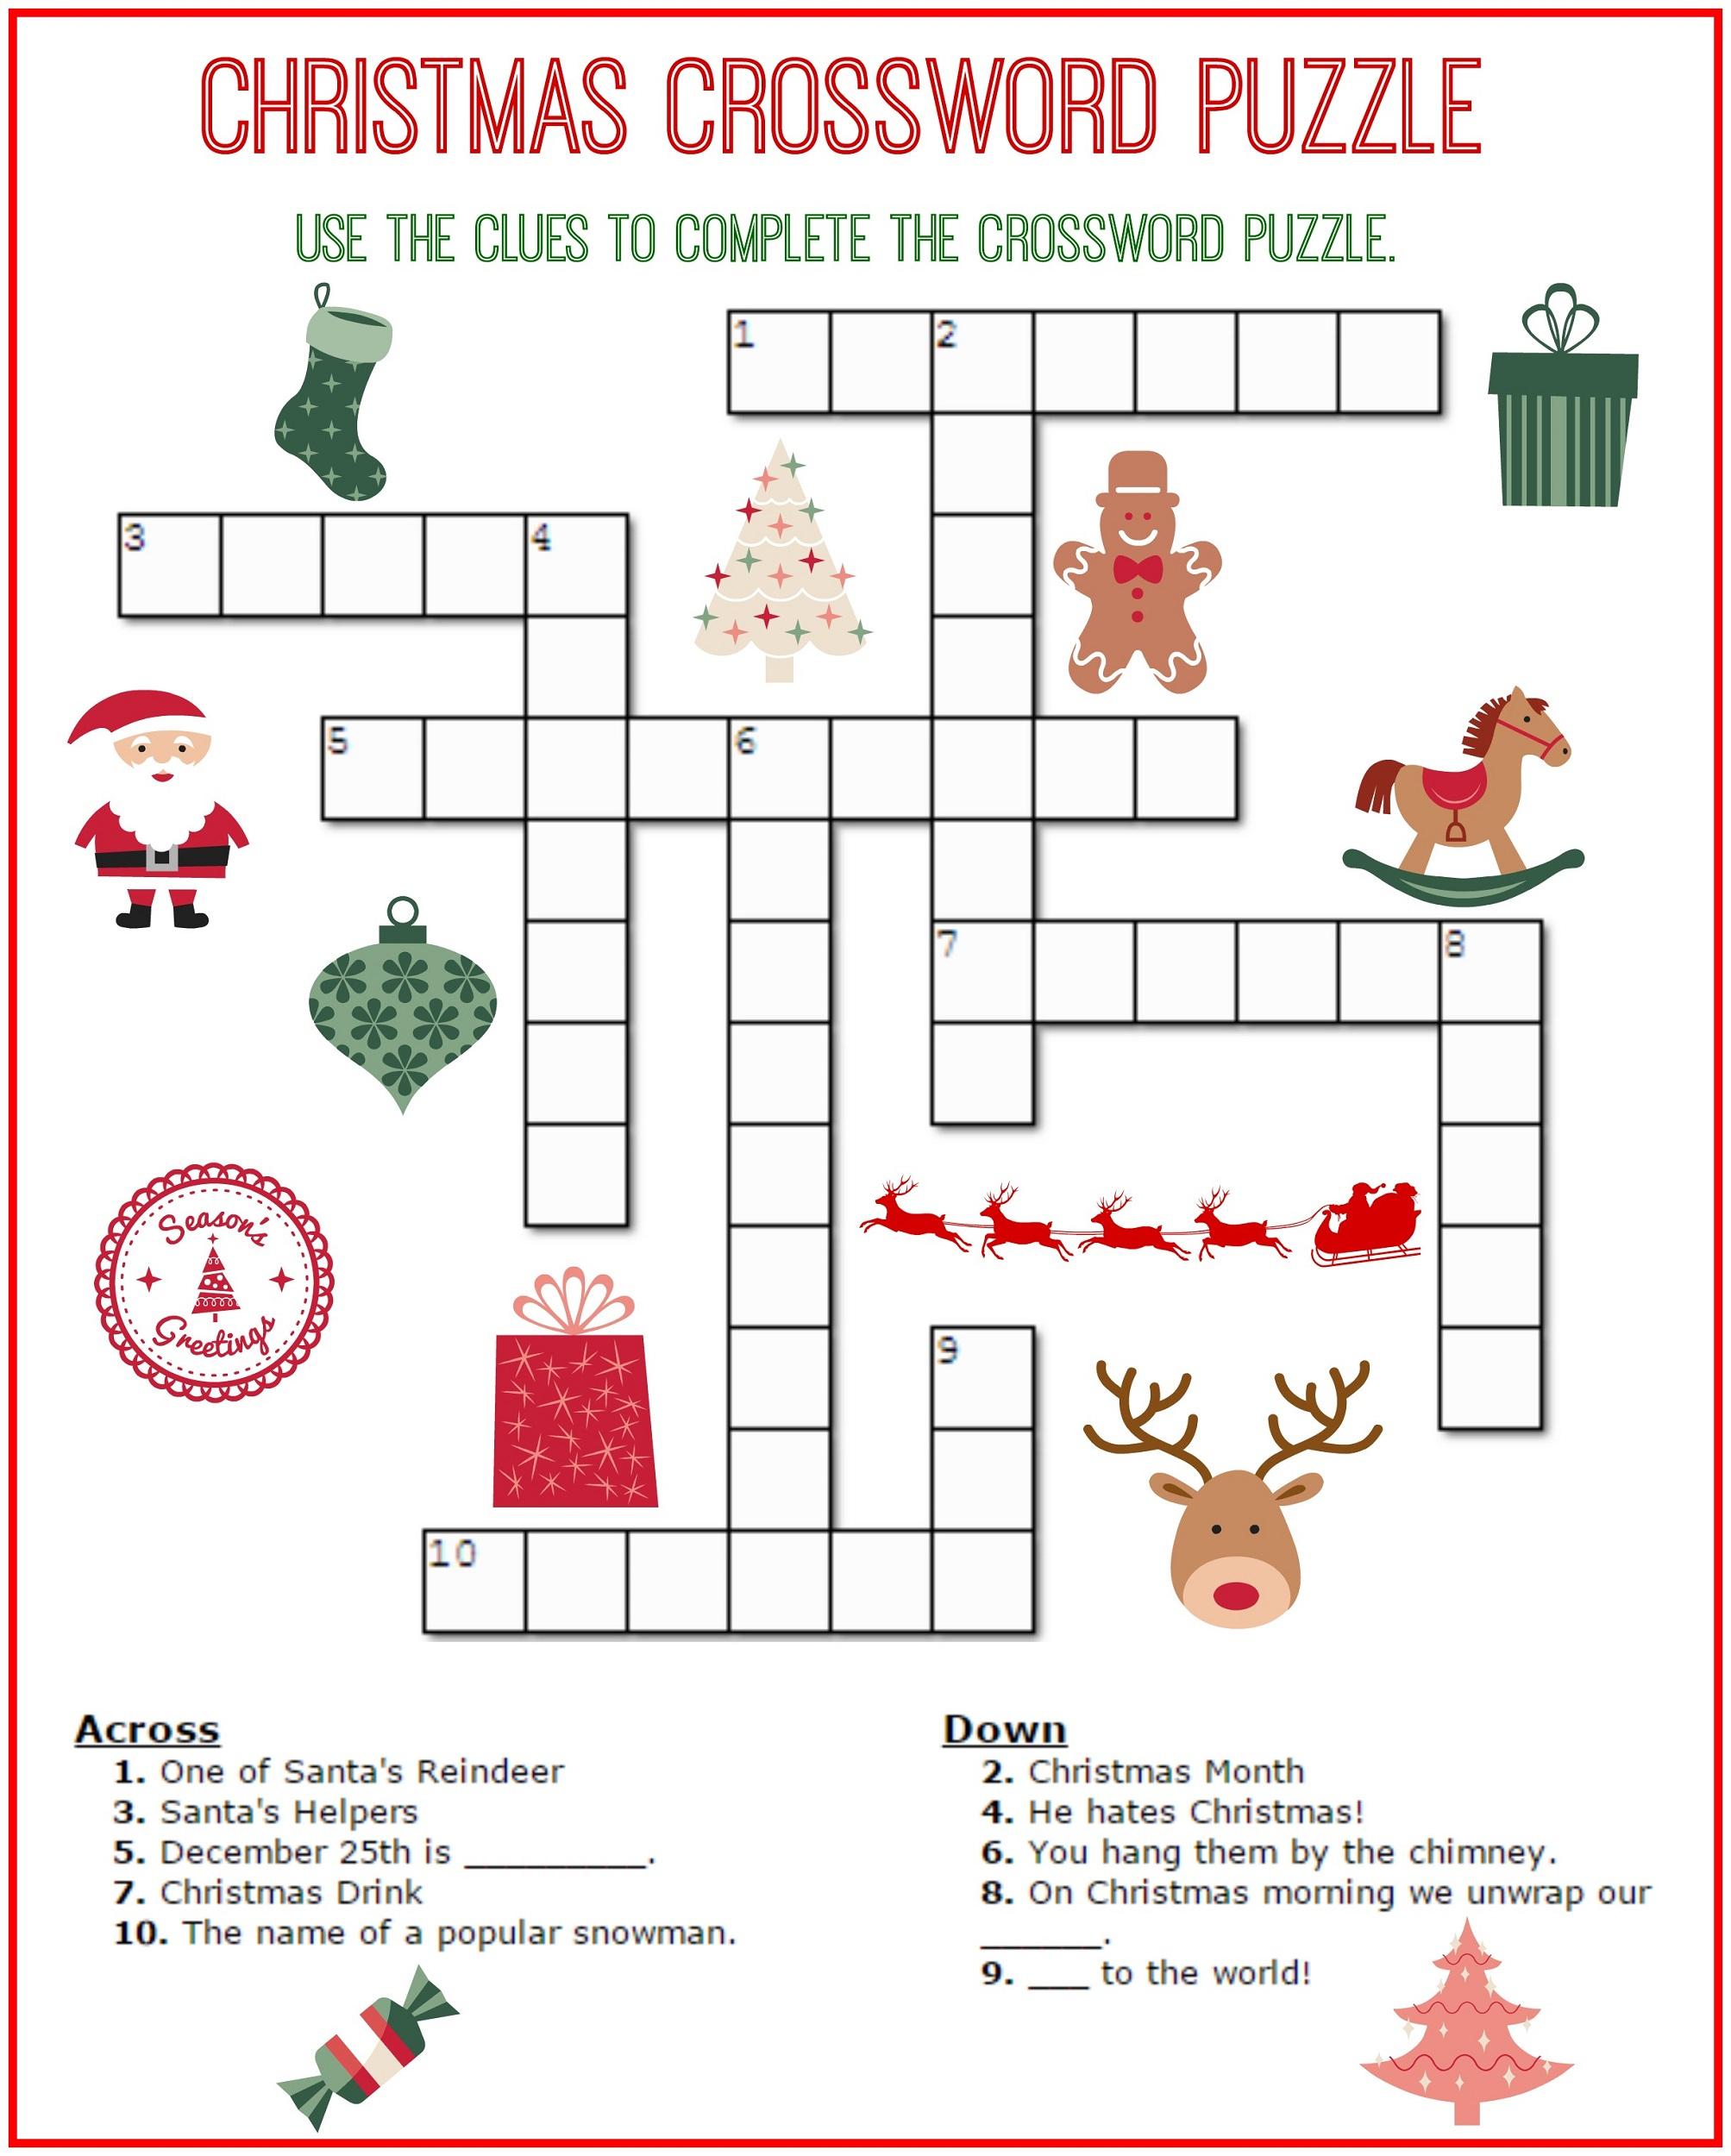 Crossword Puzzle Kids Printable 2017 | Kiddo Shelter - Free Easy - Easy Crossword Puzzles Printable For Kids